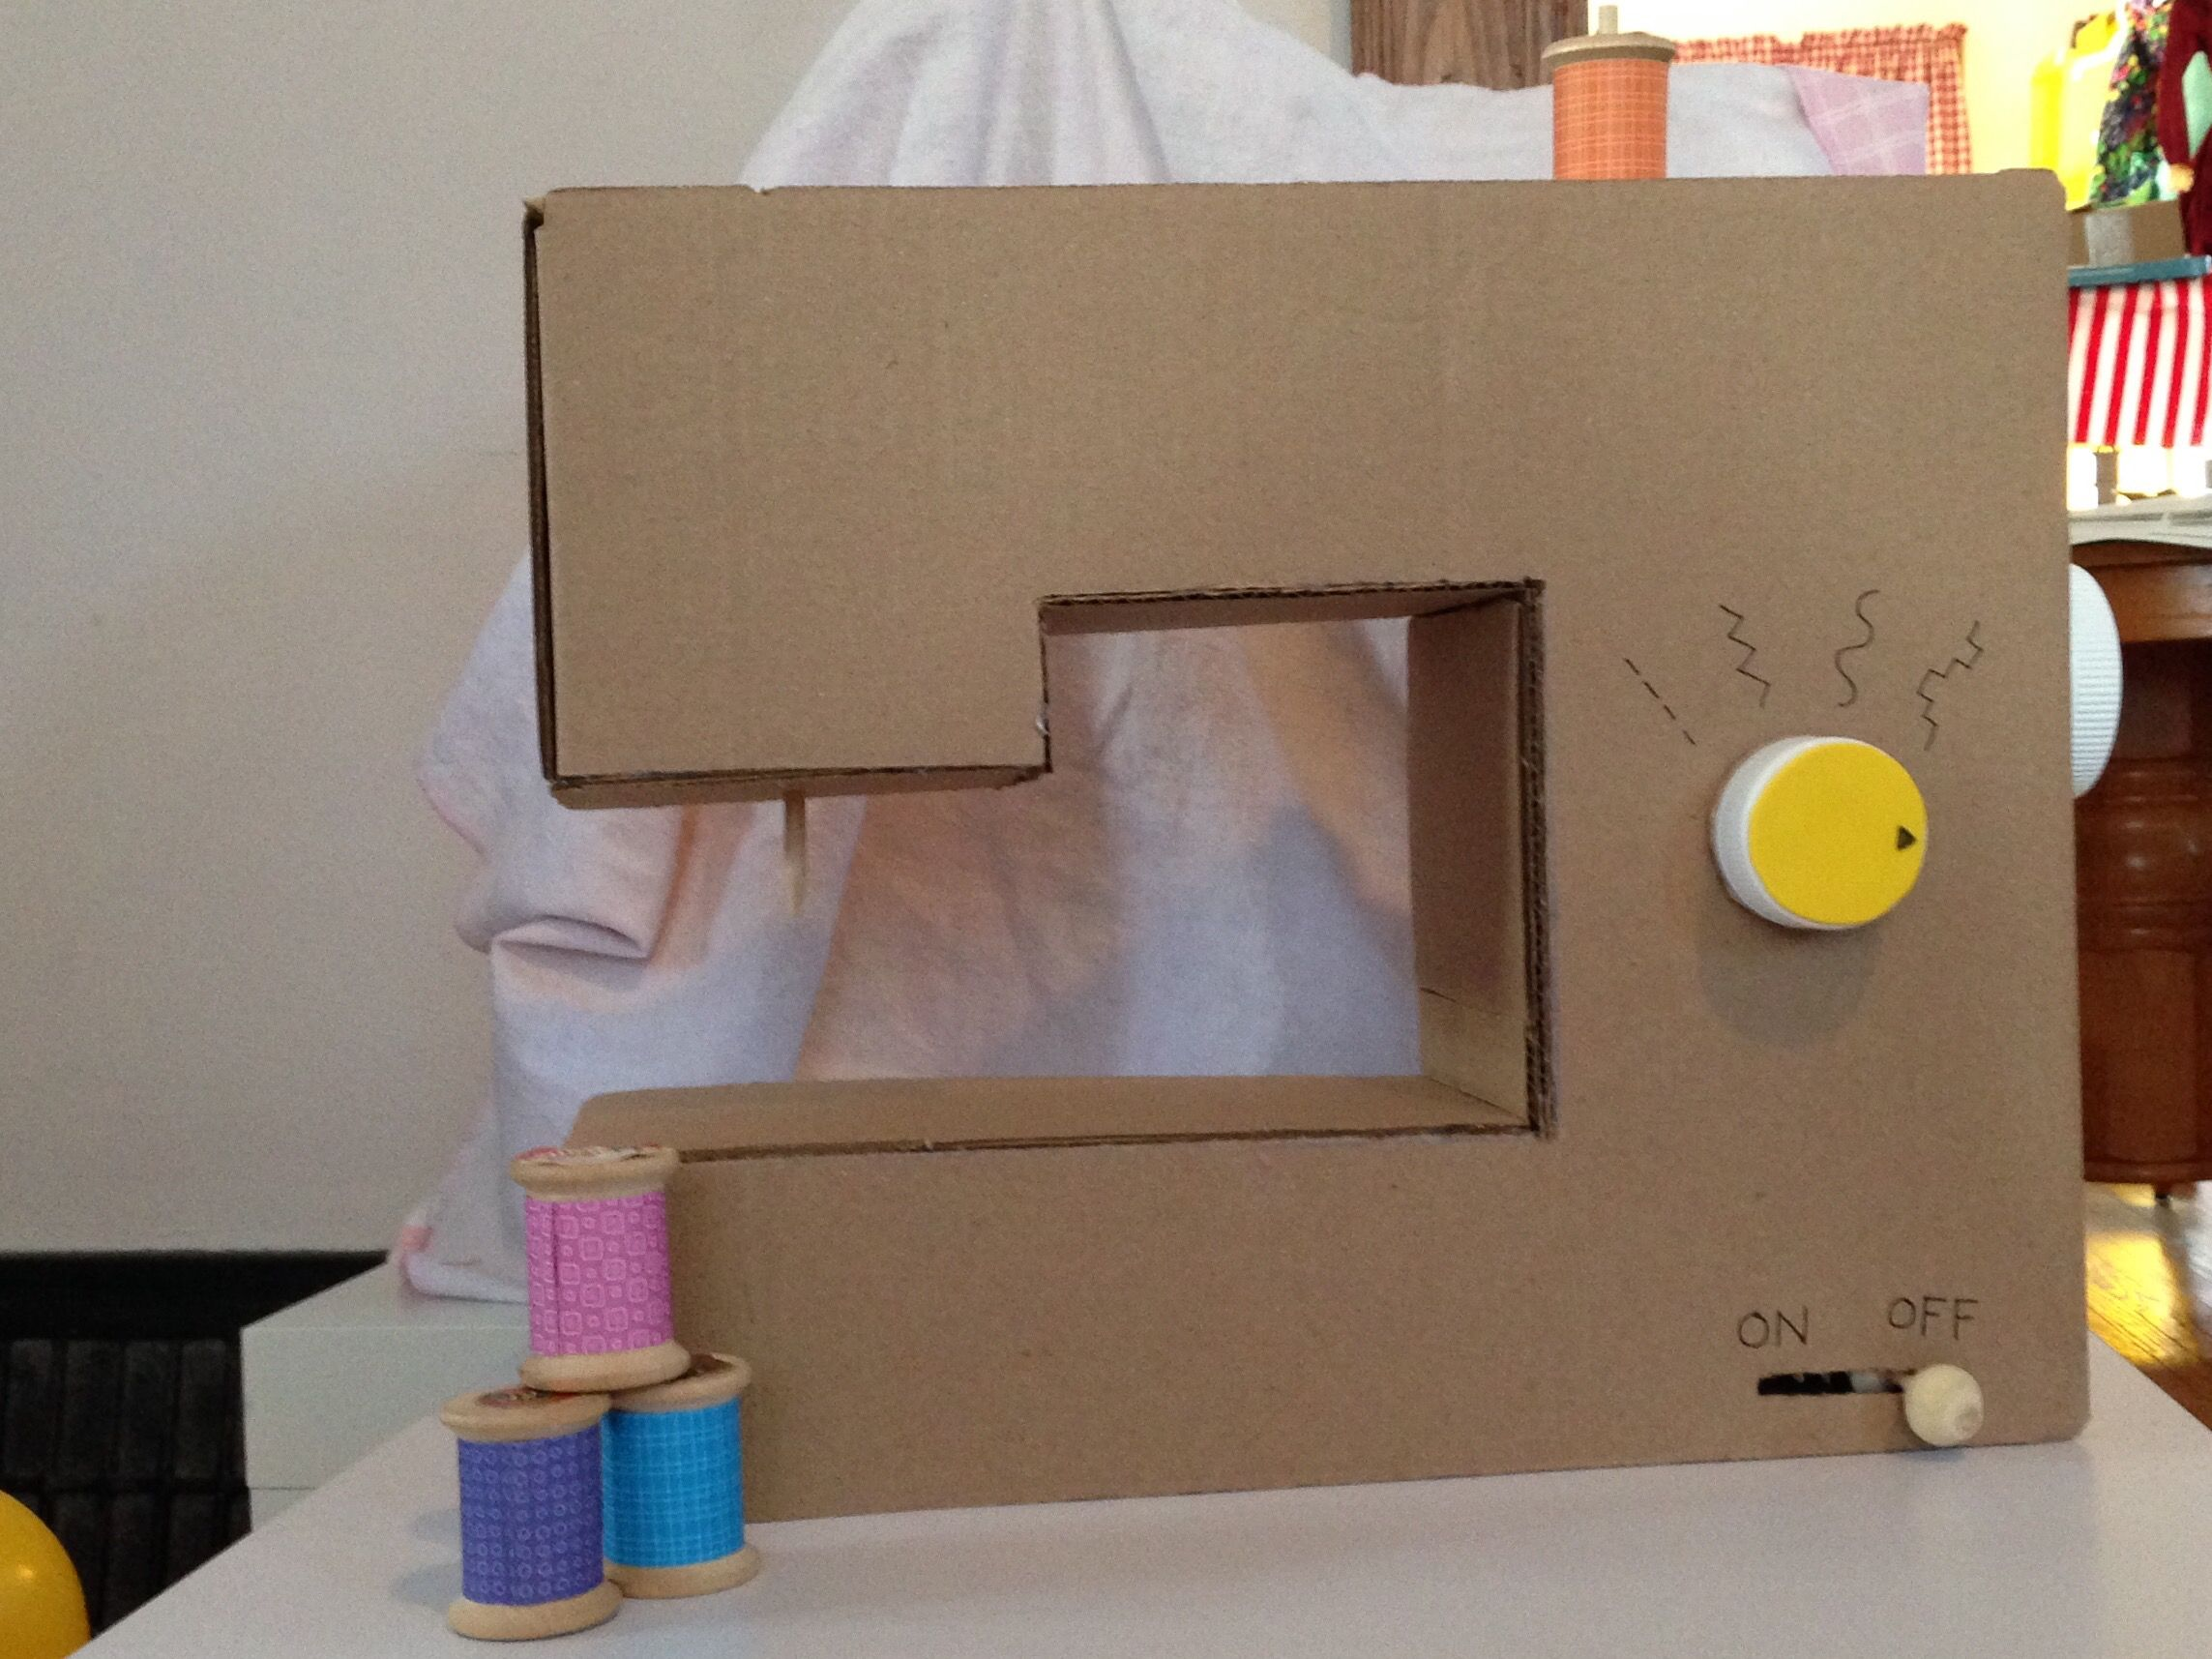 Pin By Cierrah Garrison On My Froggy Stuff Cardboard Box